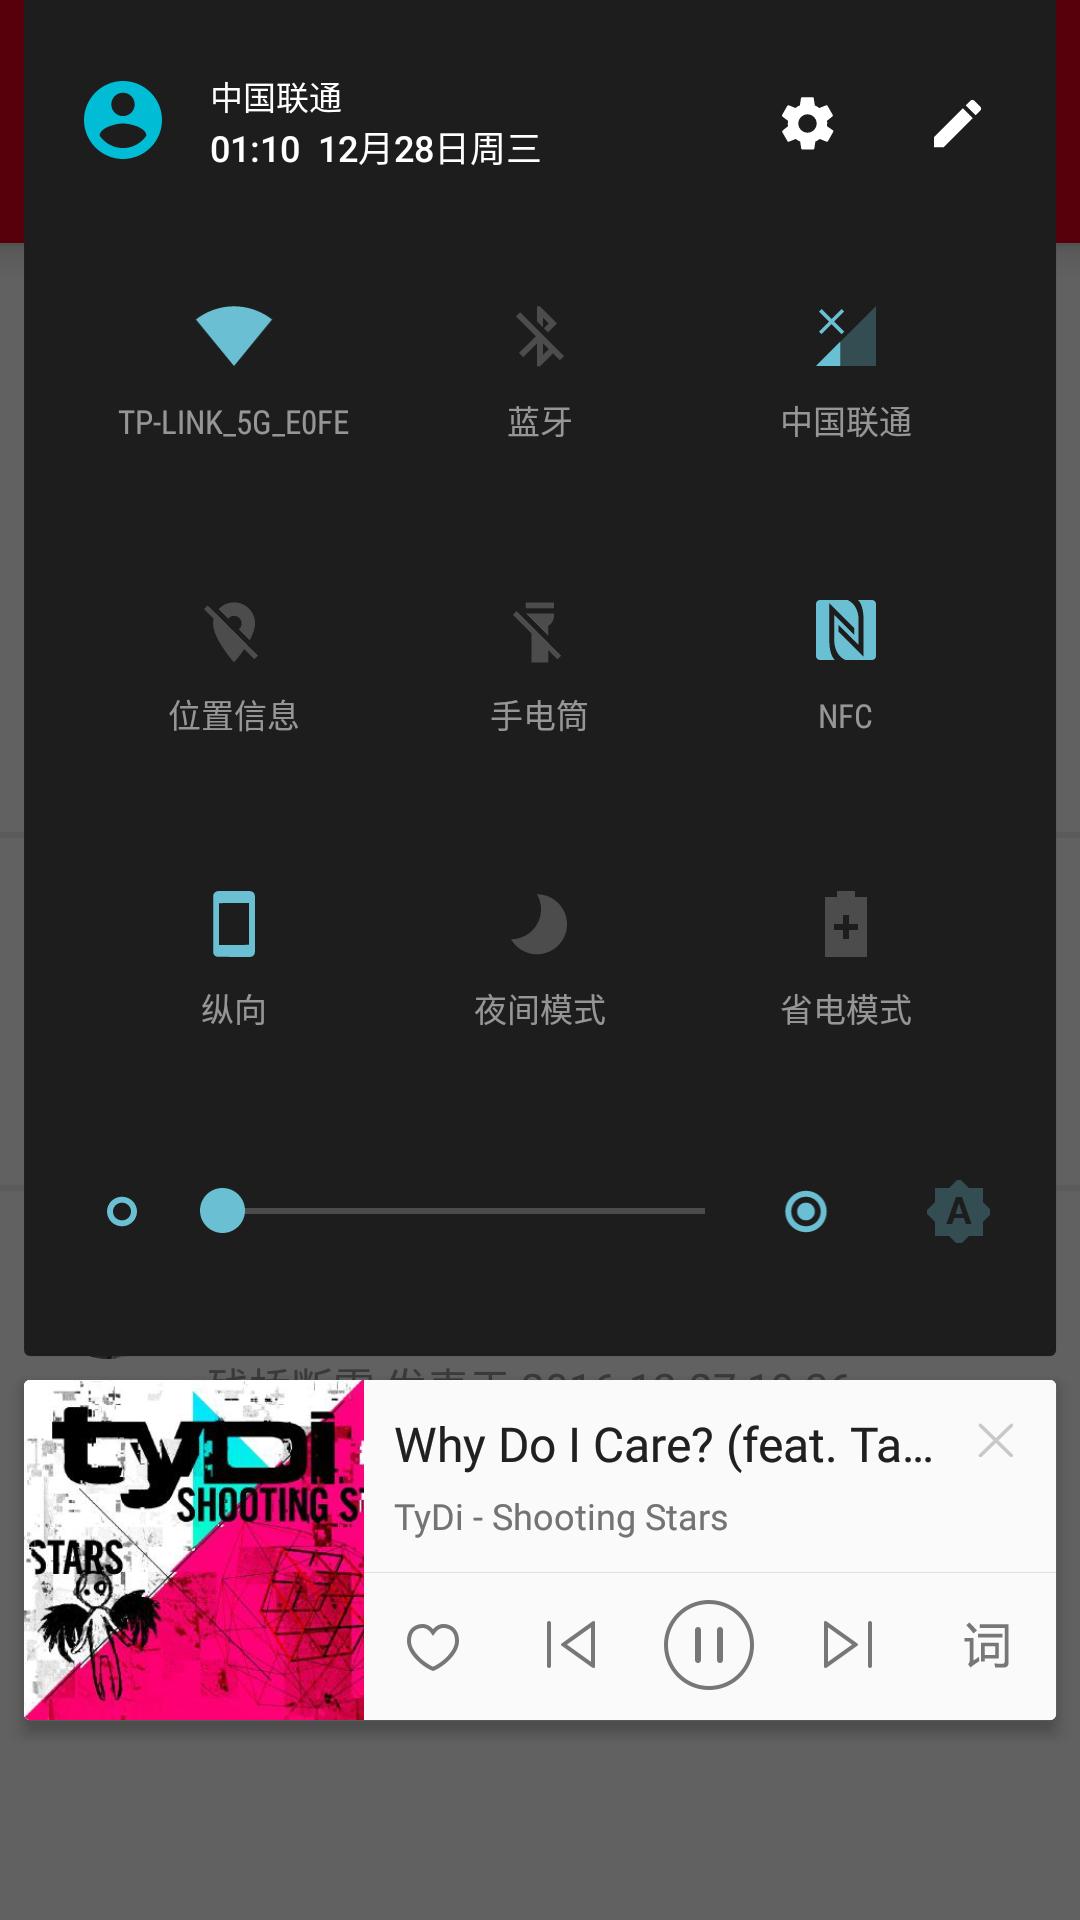 Screenshot_20161228-011014.png